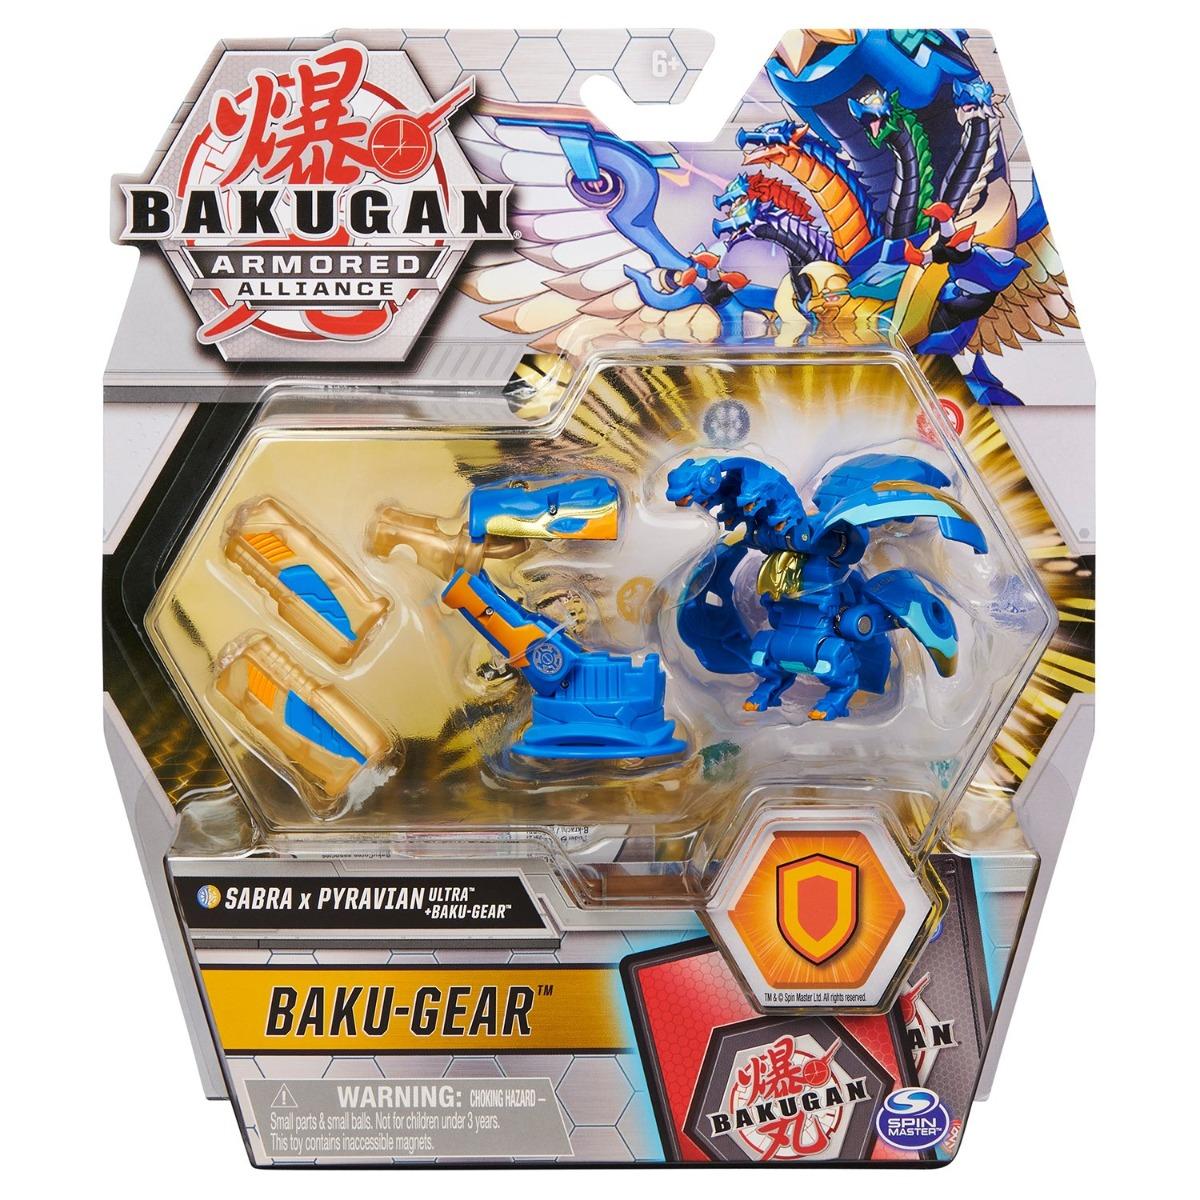 Figurina Bakugan Armored Alliance, Sabra x Pyravian Ultra, Baku-Gear, 20126003